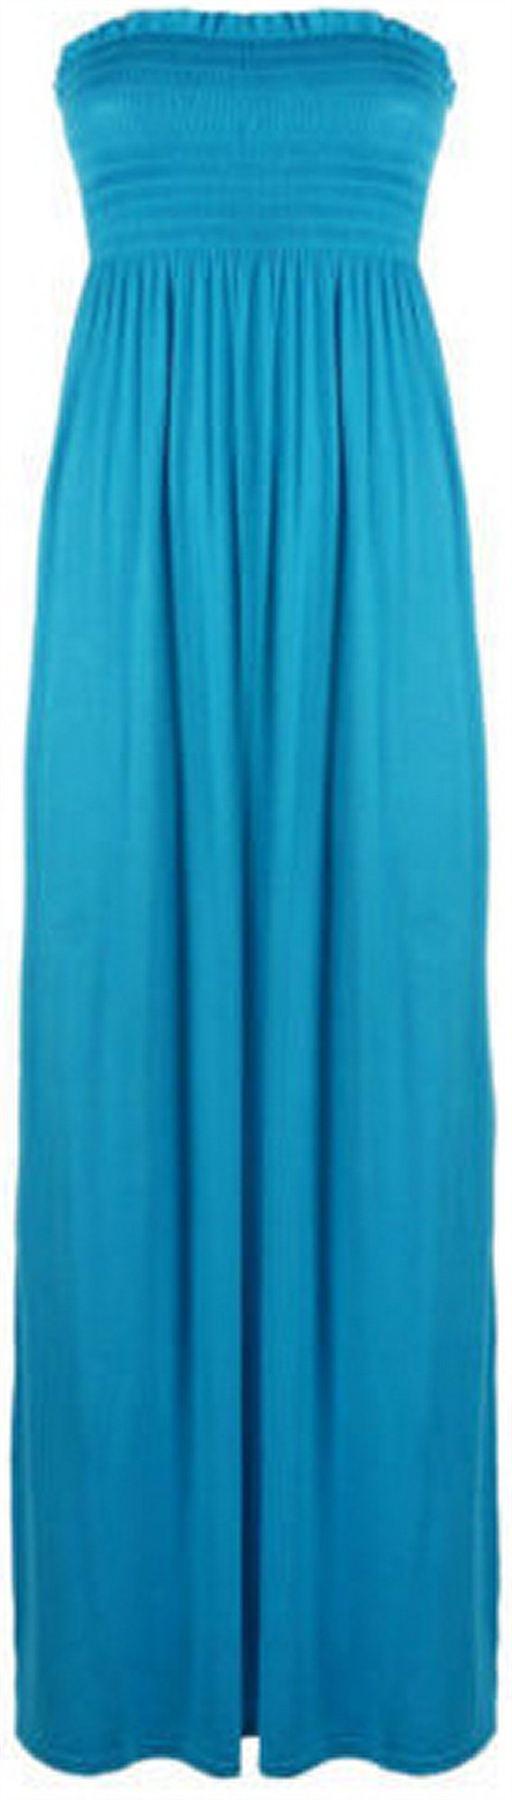 Womens-Plus-Size-Boob-Tube-Maxi-Stretch-Sheering-Summer-Beach-Maxi-8-26